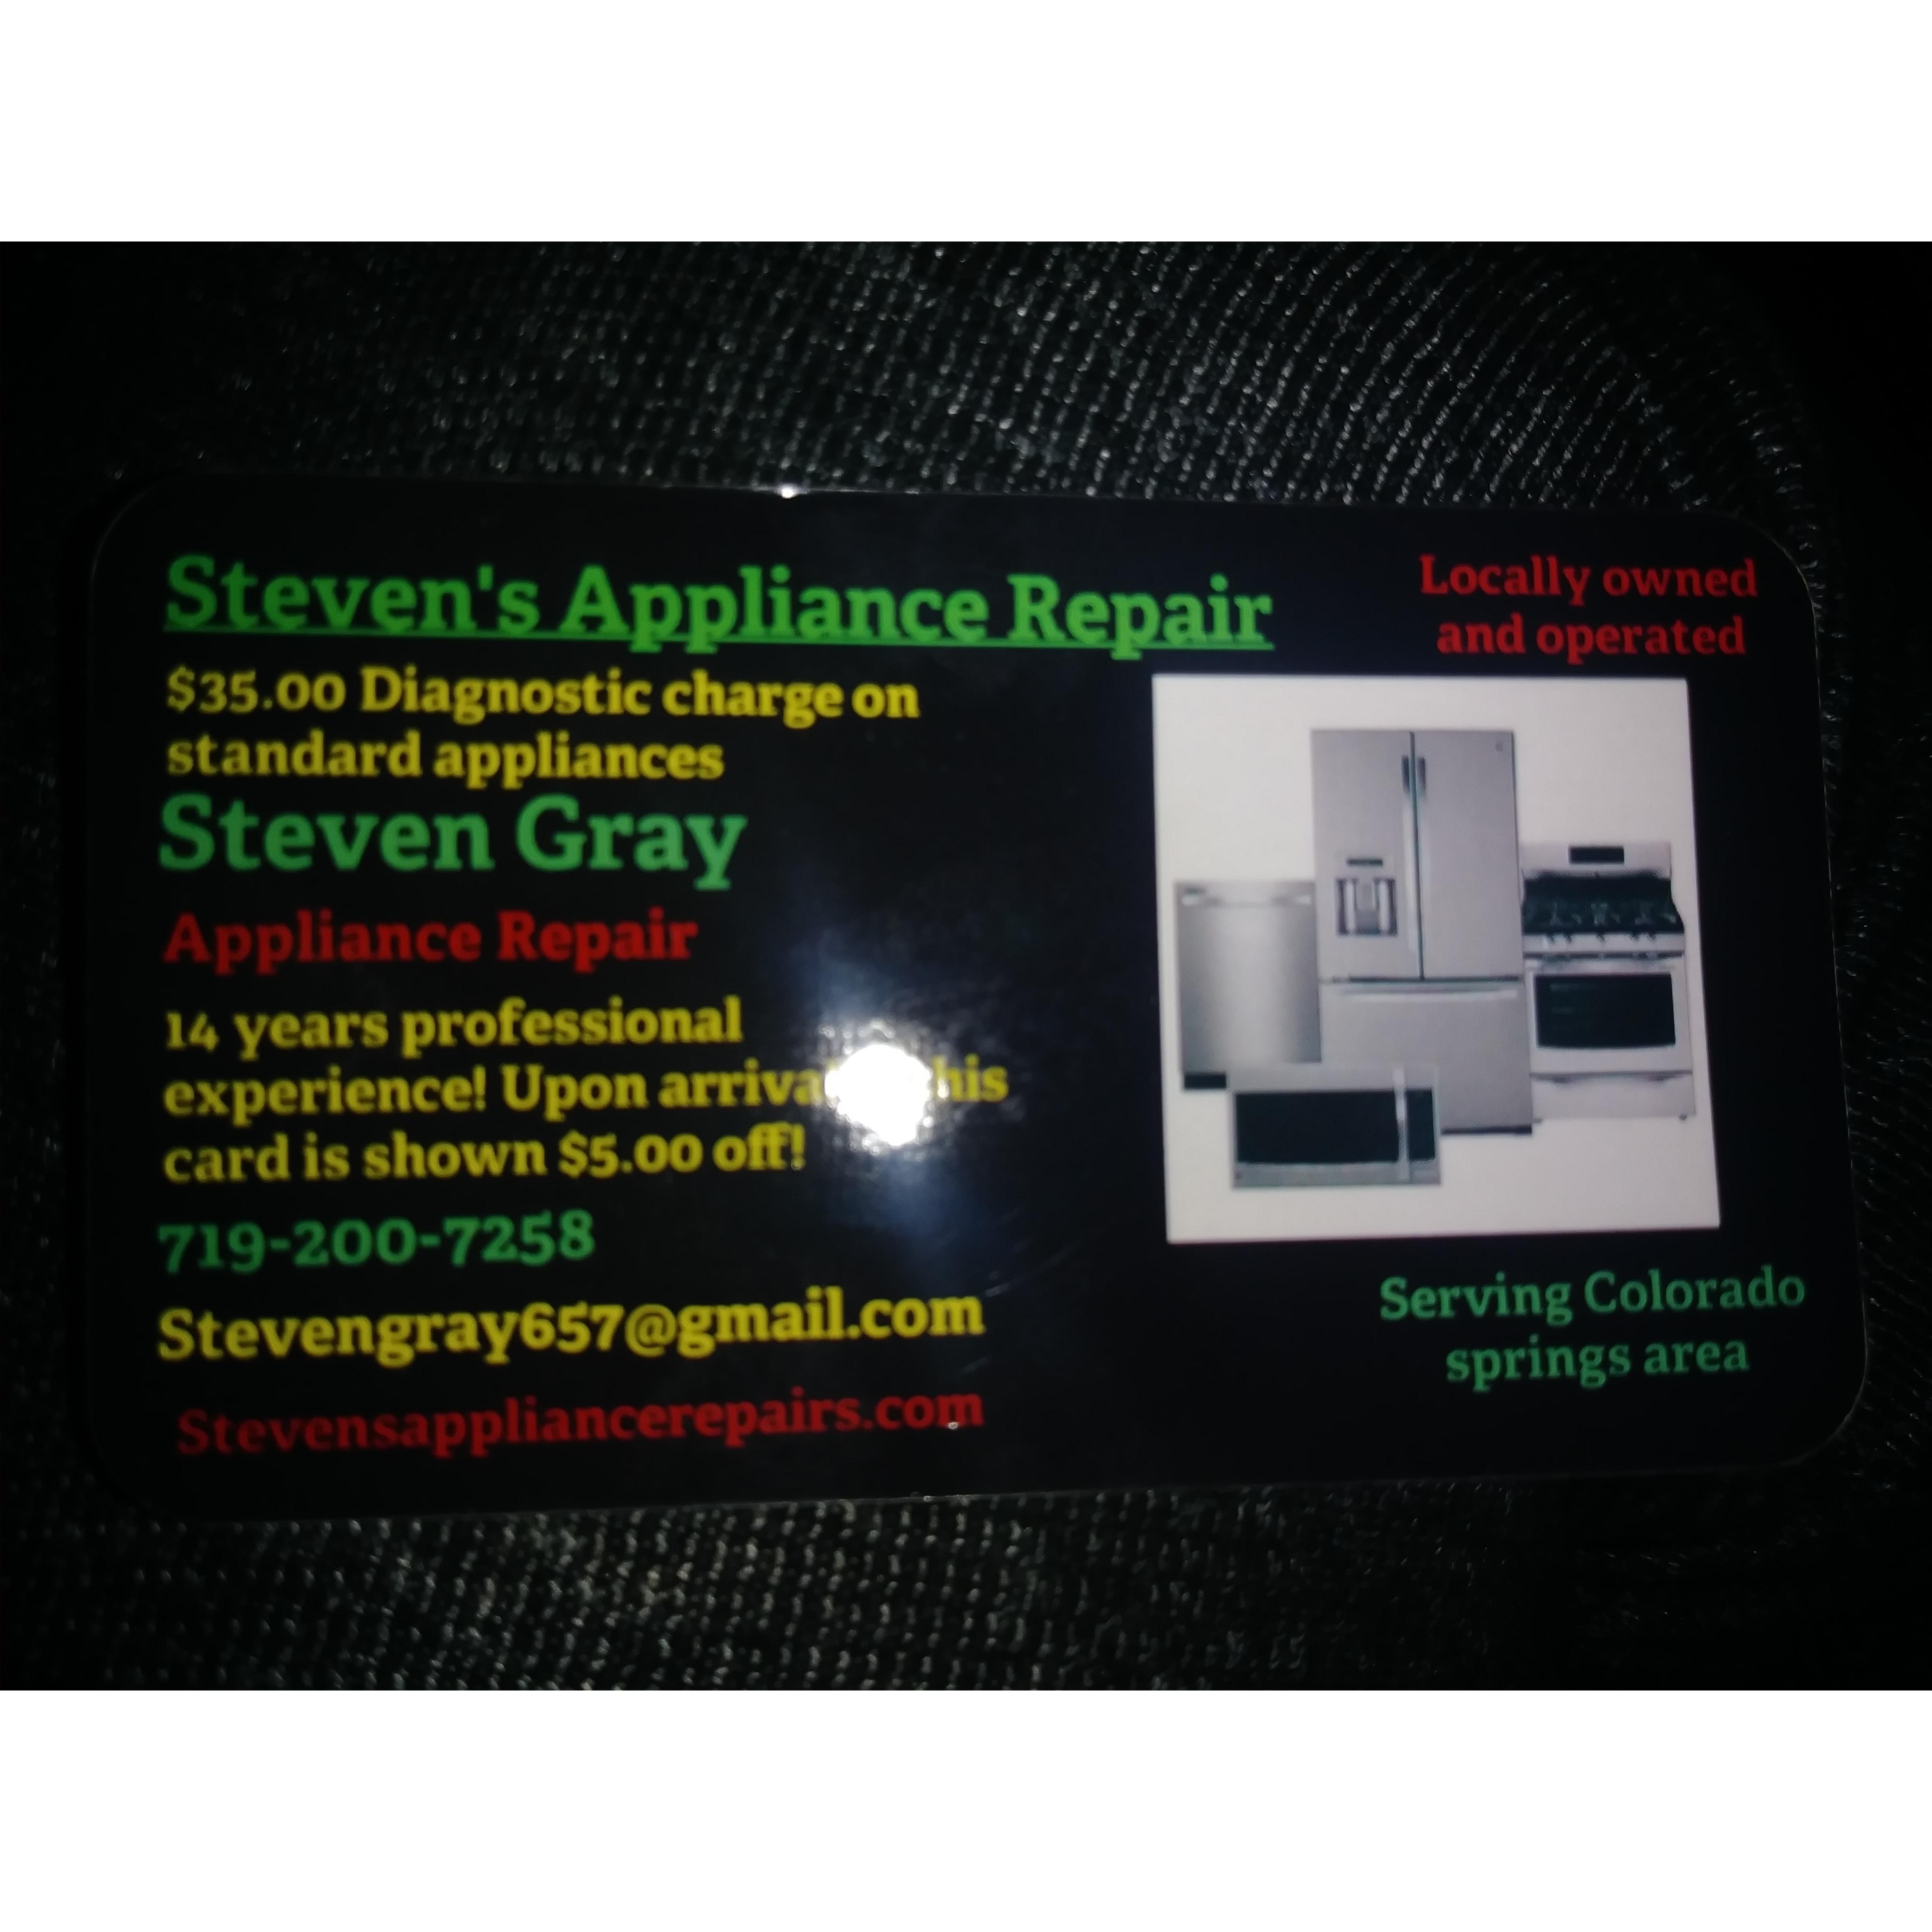 Stevens appliance repair